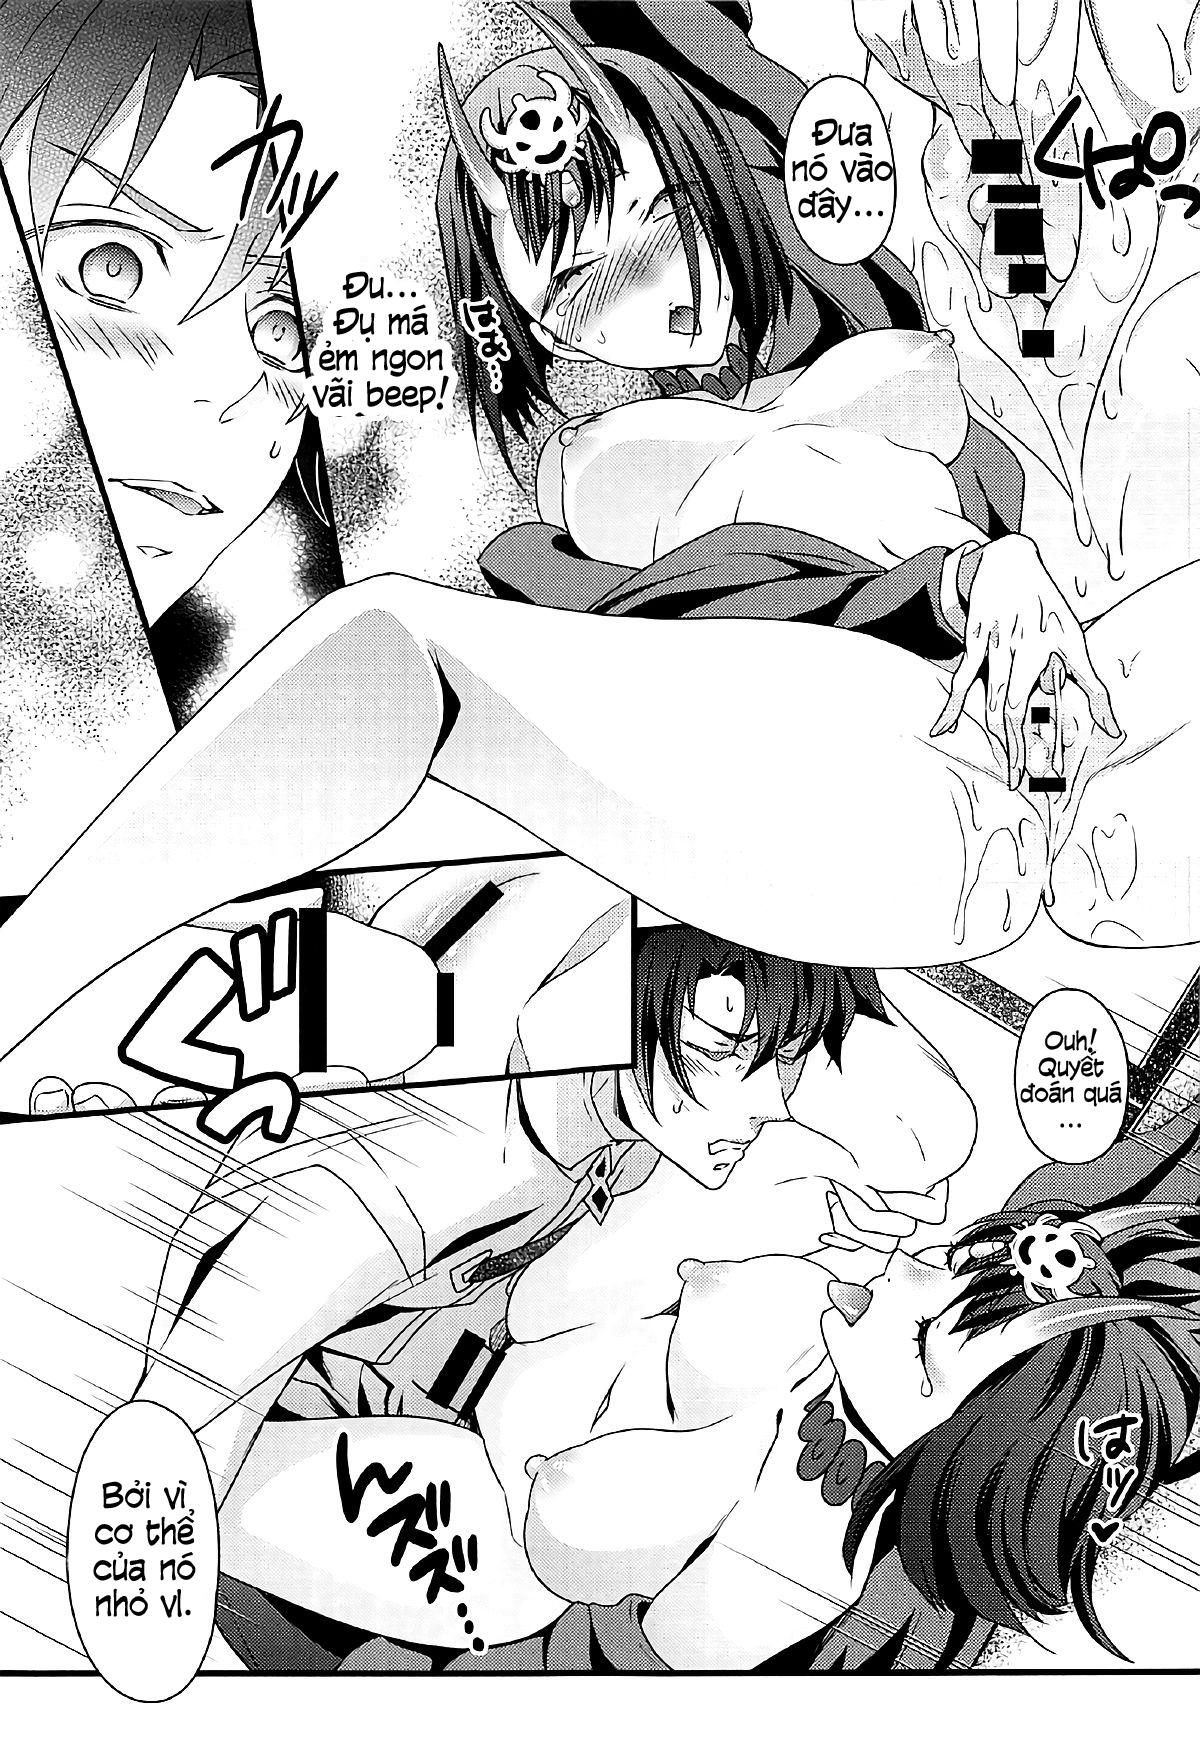 HentaiVN.net - Ảnh 10 - Chimimouryou Kikikaikai (Fate/Grand Order) [Việt Sub] - [うに蔵 (うに蔵)] 痴魅妄陵嬉々快界 (Fate/Grand Order) - Oneshot